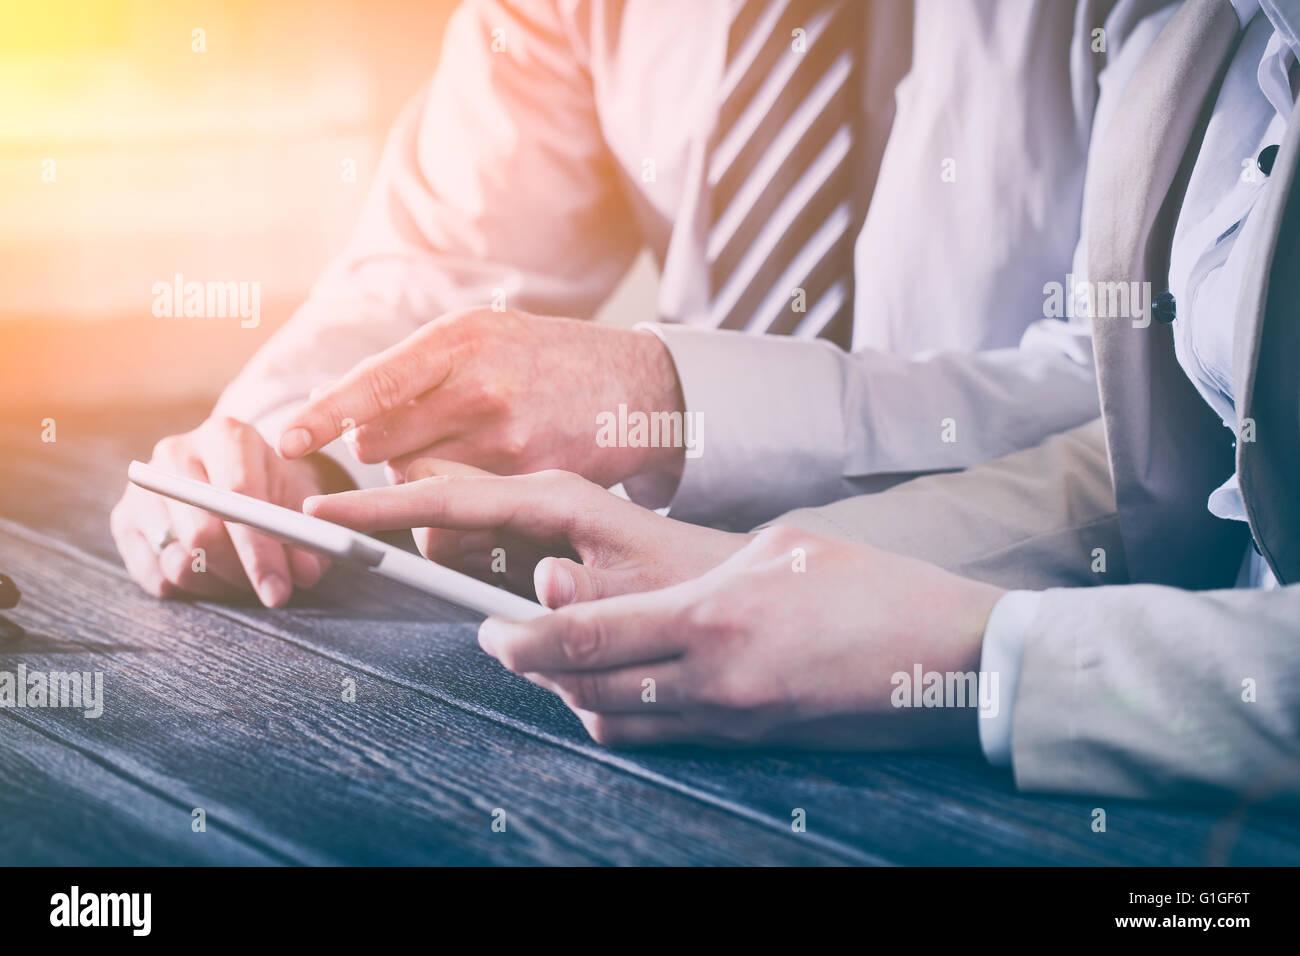 Business meeting Consulenza per executive review report di carriera tablet - immagine di stock Immagini Stock